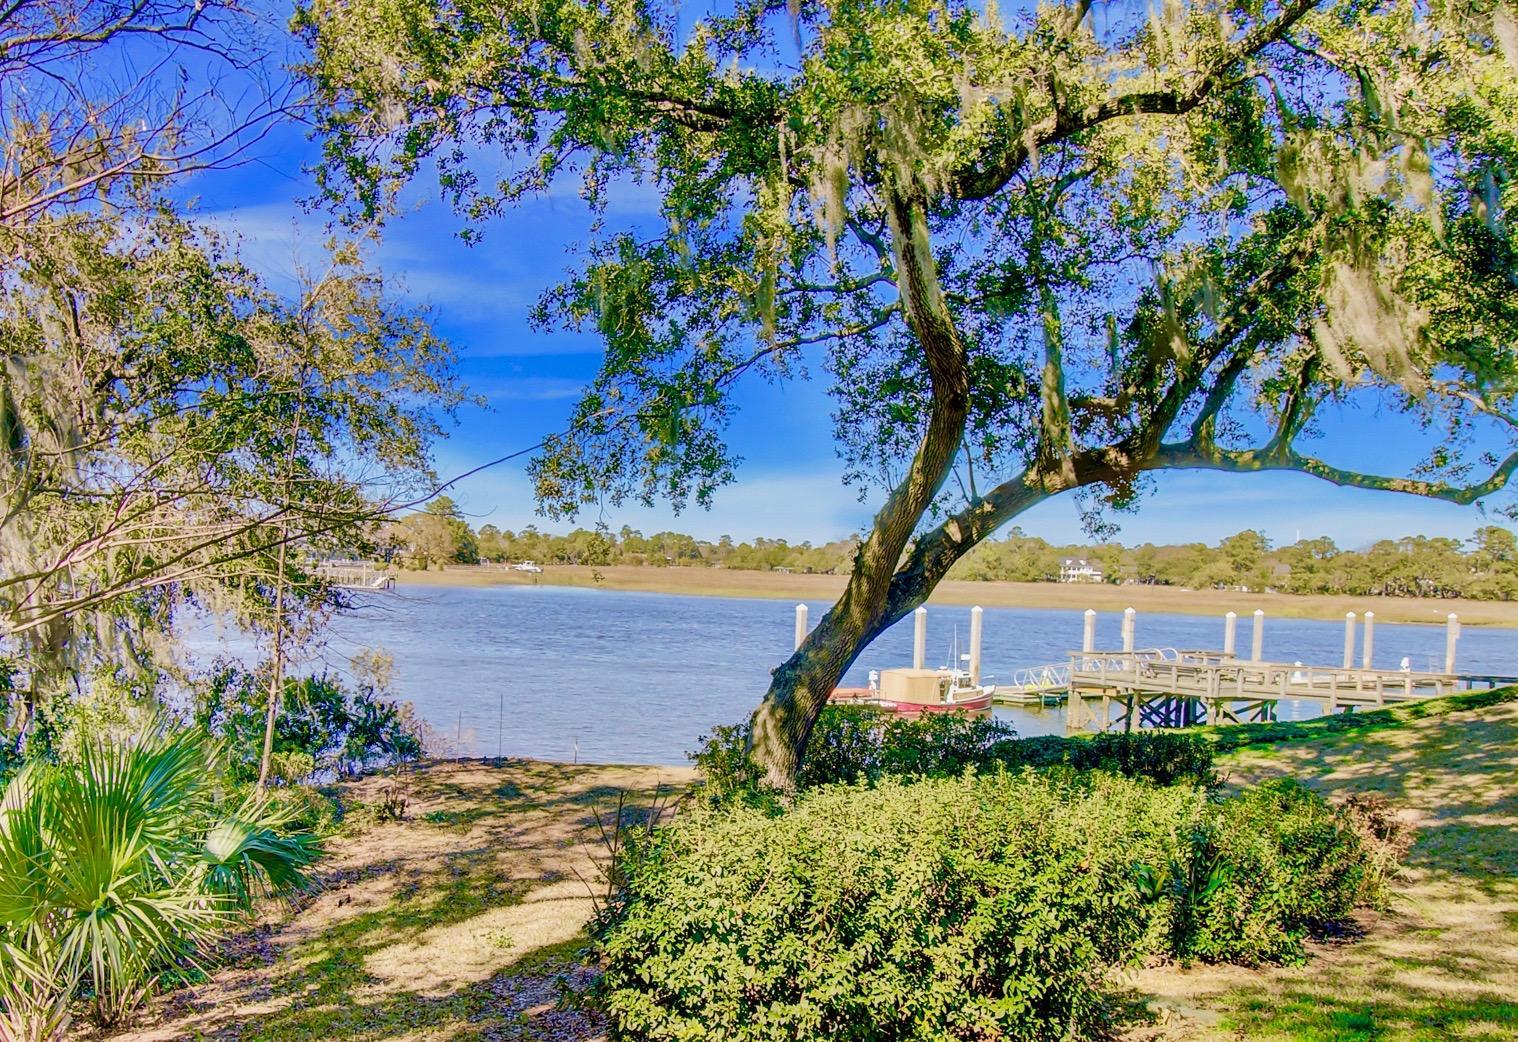 Wappoo Creek Place Homes For Sale - 29 Wappoo Creek, Charleston, SC - 29